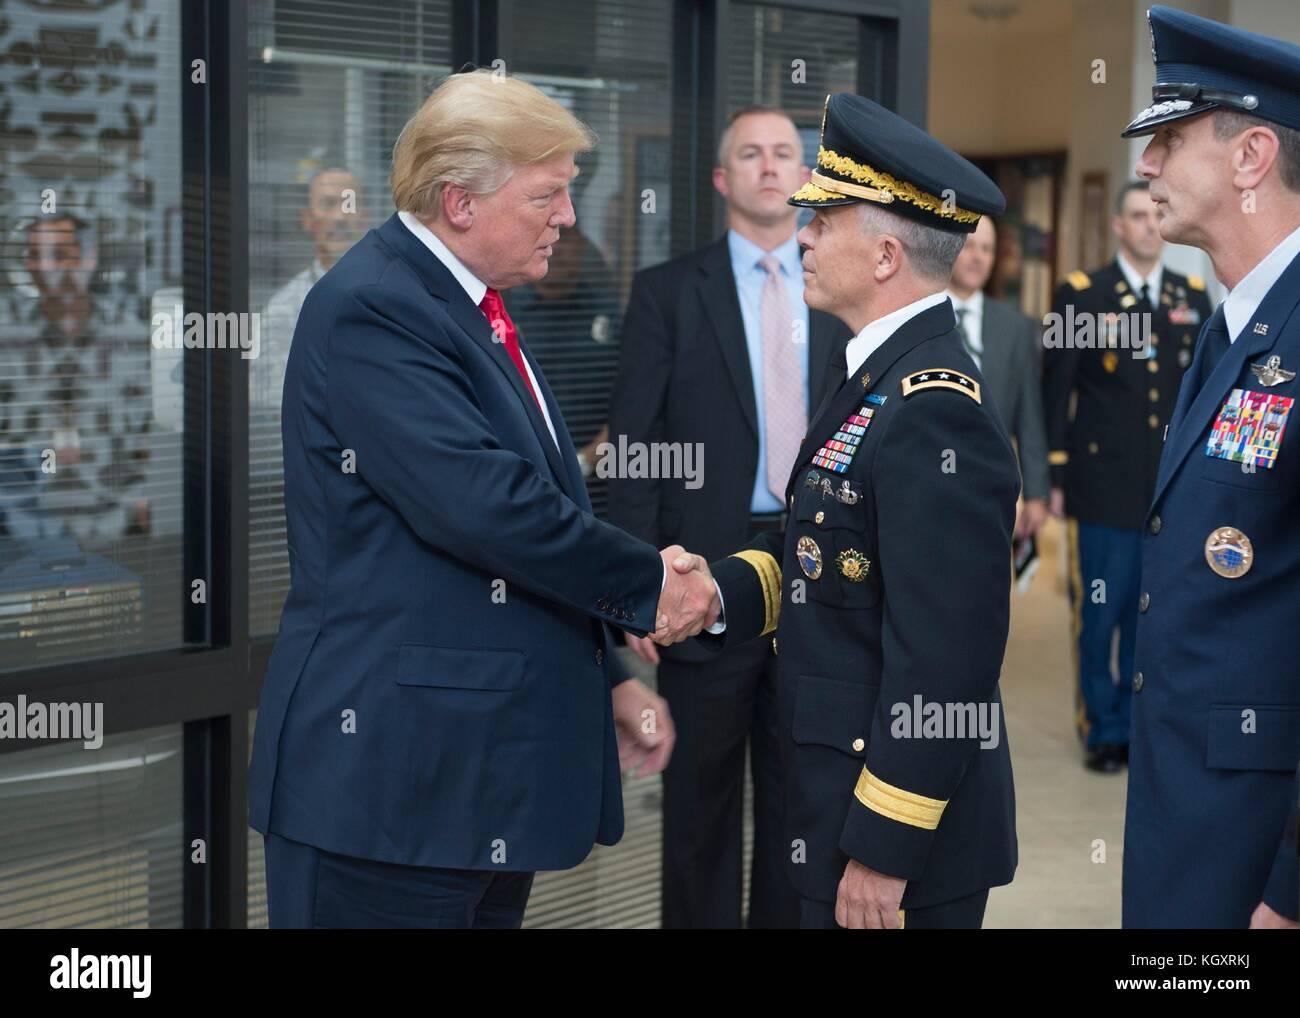 U.S. President Donald Trump (left) greets U.S. Pacific Command (USPACOM) Deputy Commander Bryan Fenton during an - Stock Image